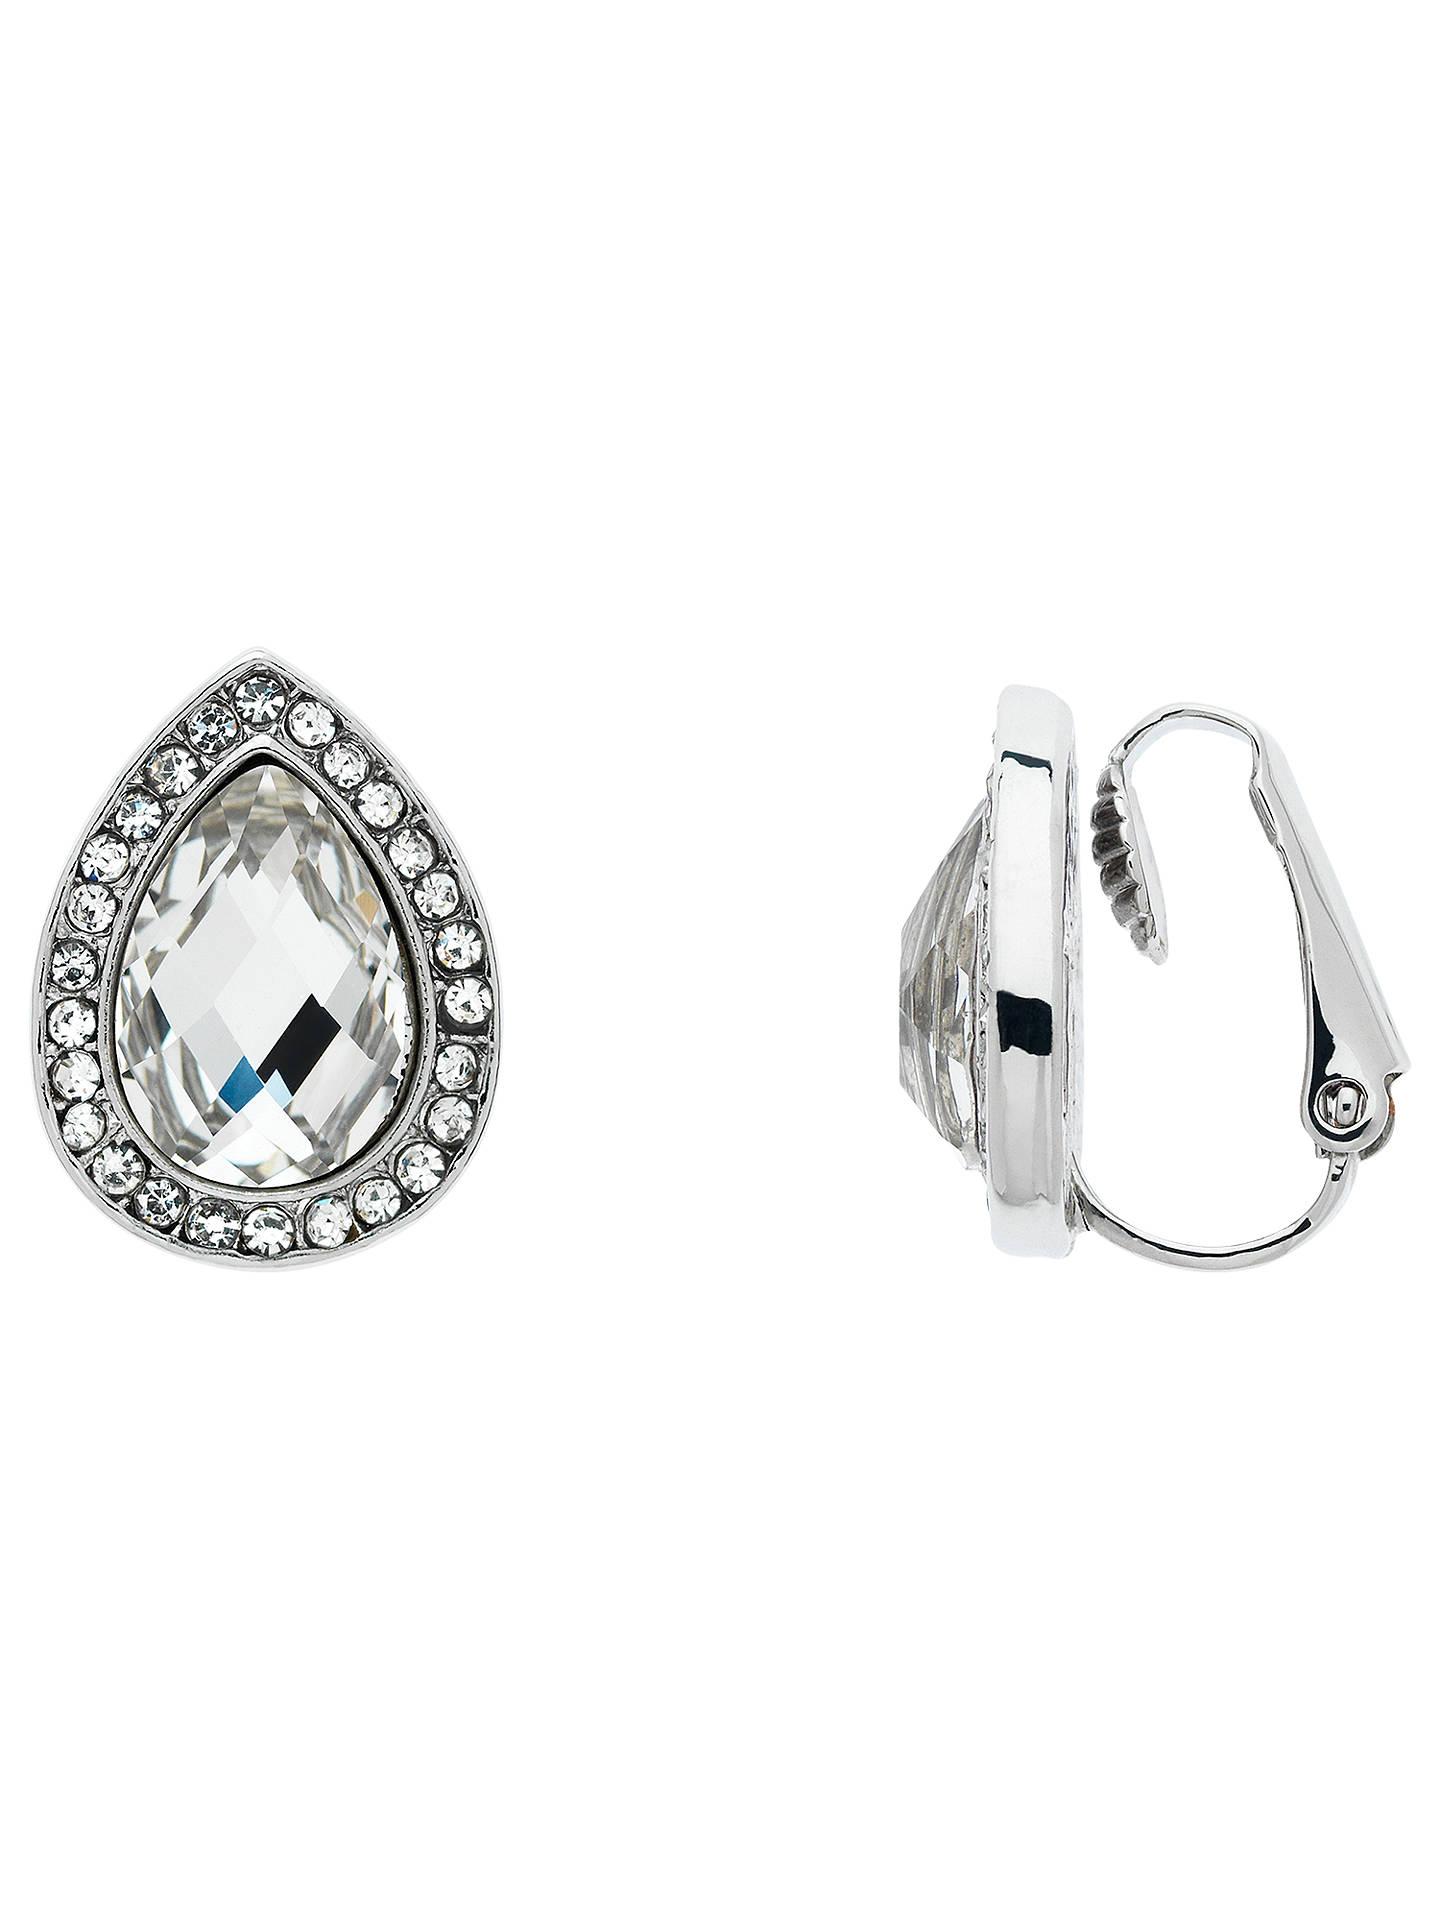 Monet Gl Crystal Teardrop Clip On Stud Earrings Silver Clear Online At Johnlewis